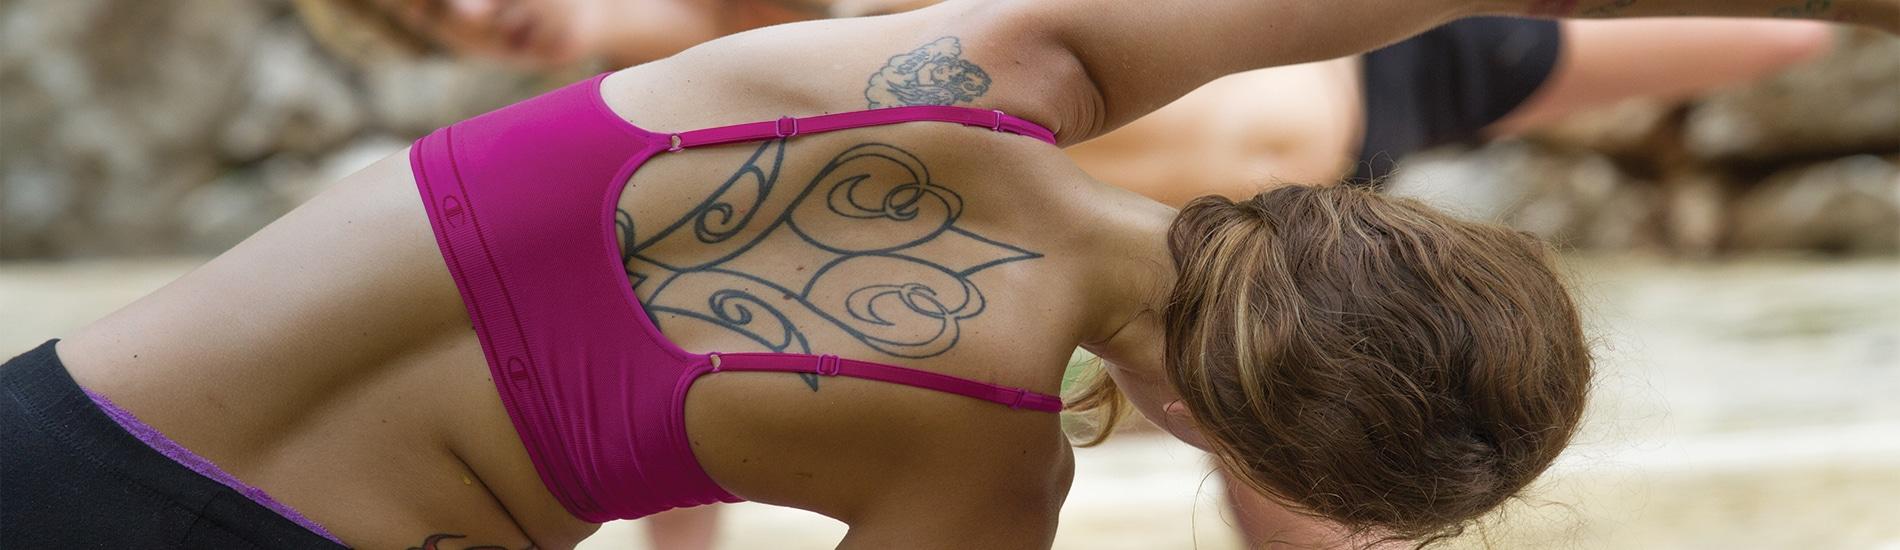 Hatha Yoga 3 Day Morning Workshop